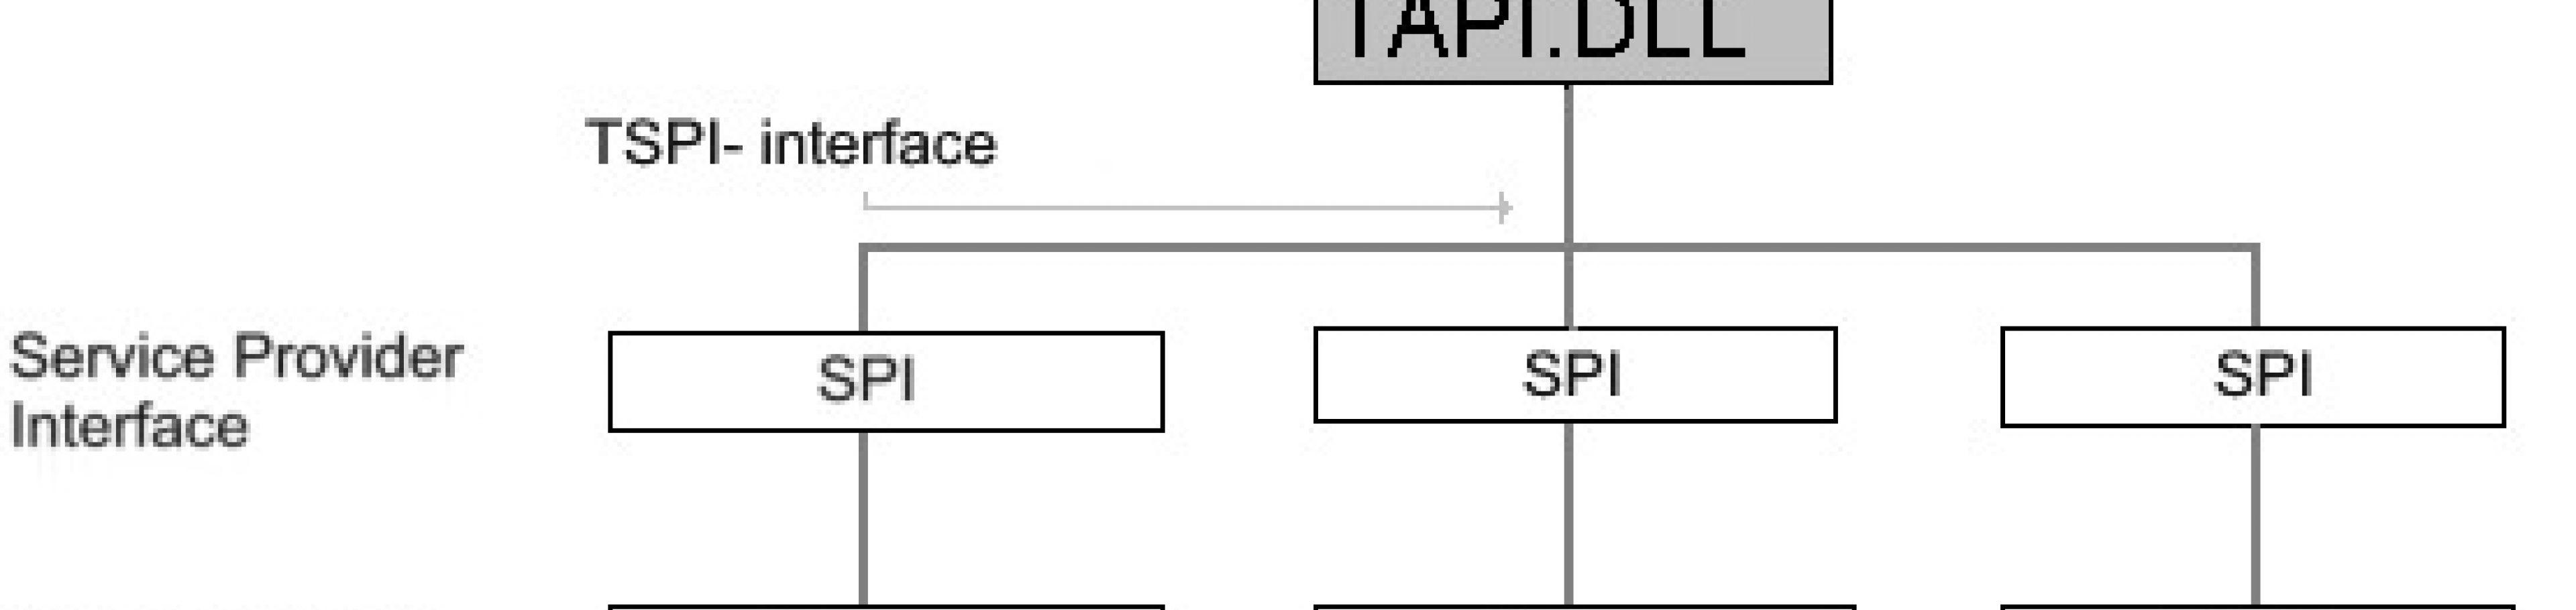 Windows Telephony Application Programming Interface Tapi